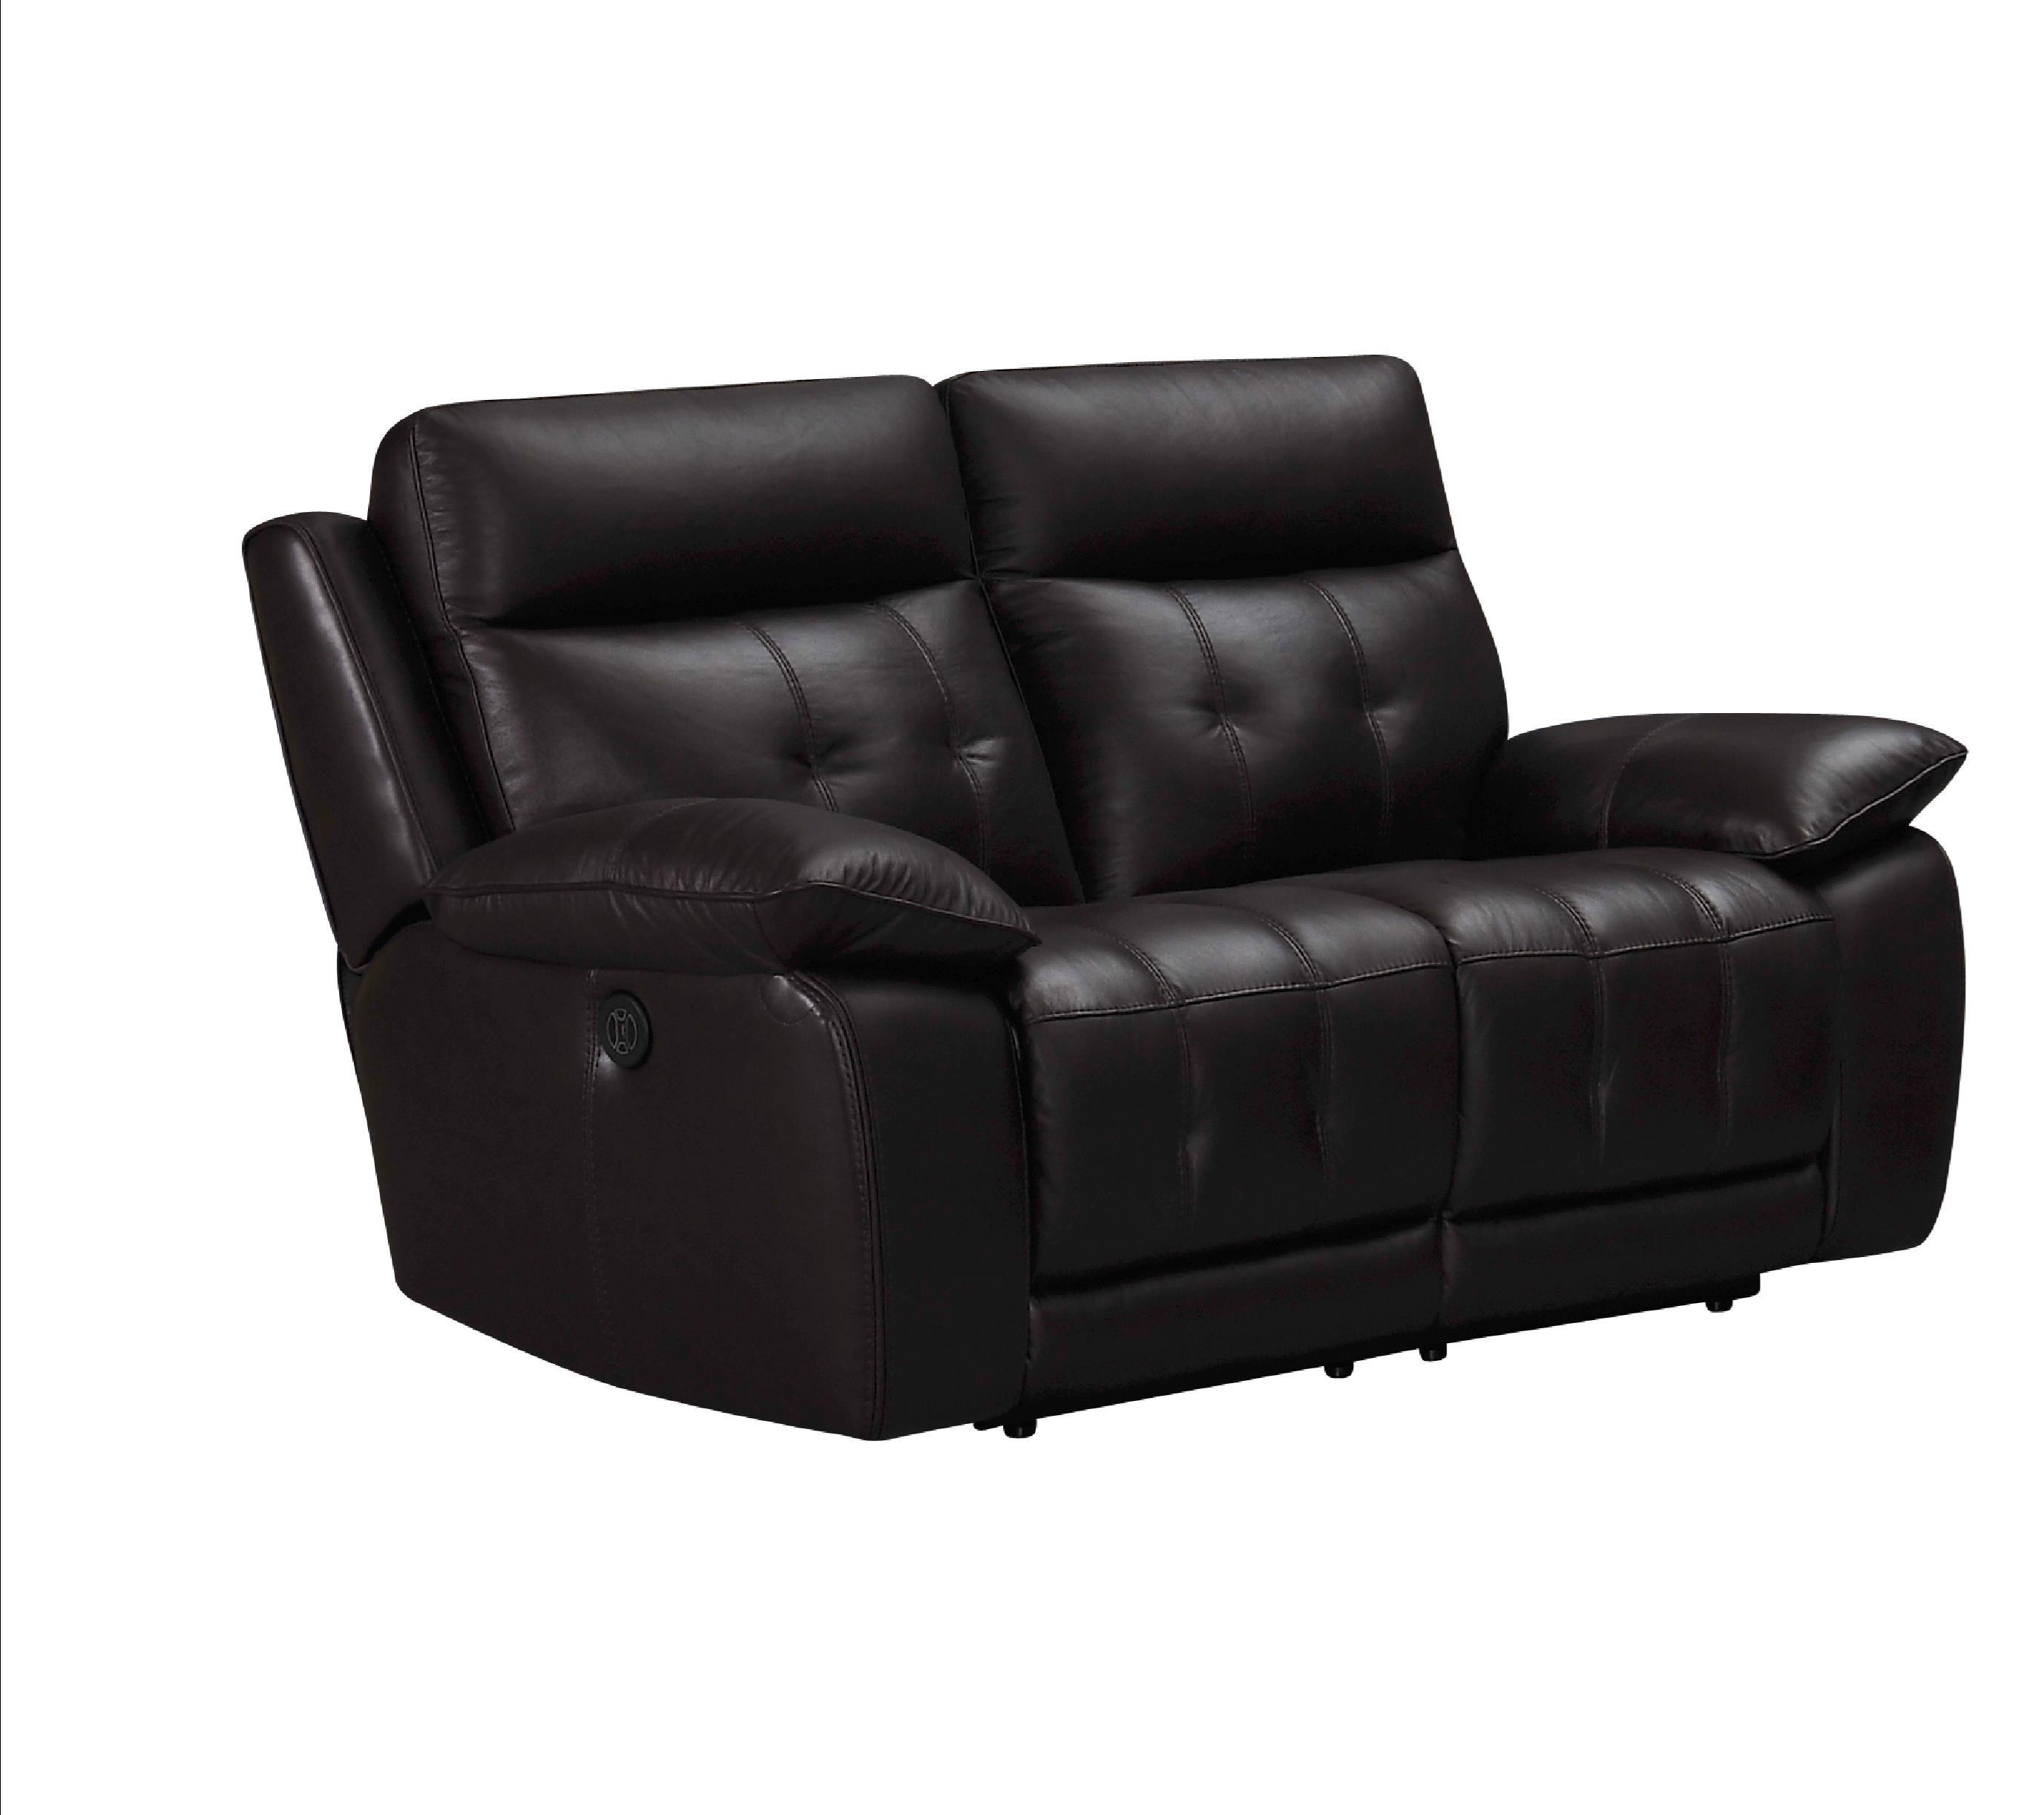 31724 Power Motion Loveseat at Bennett's Furniture and Mattresses